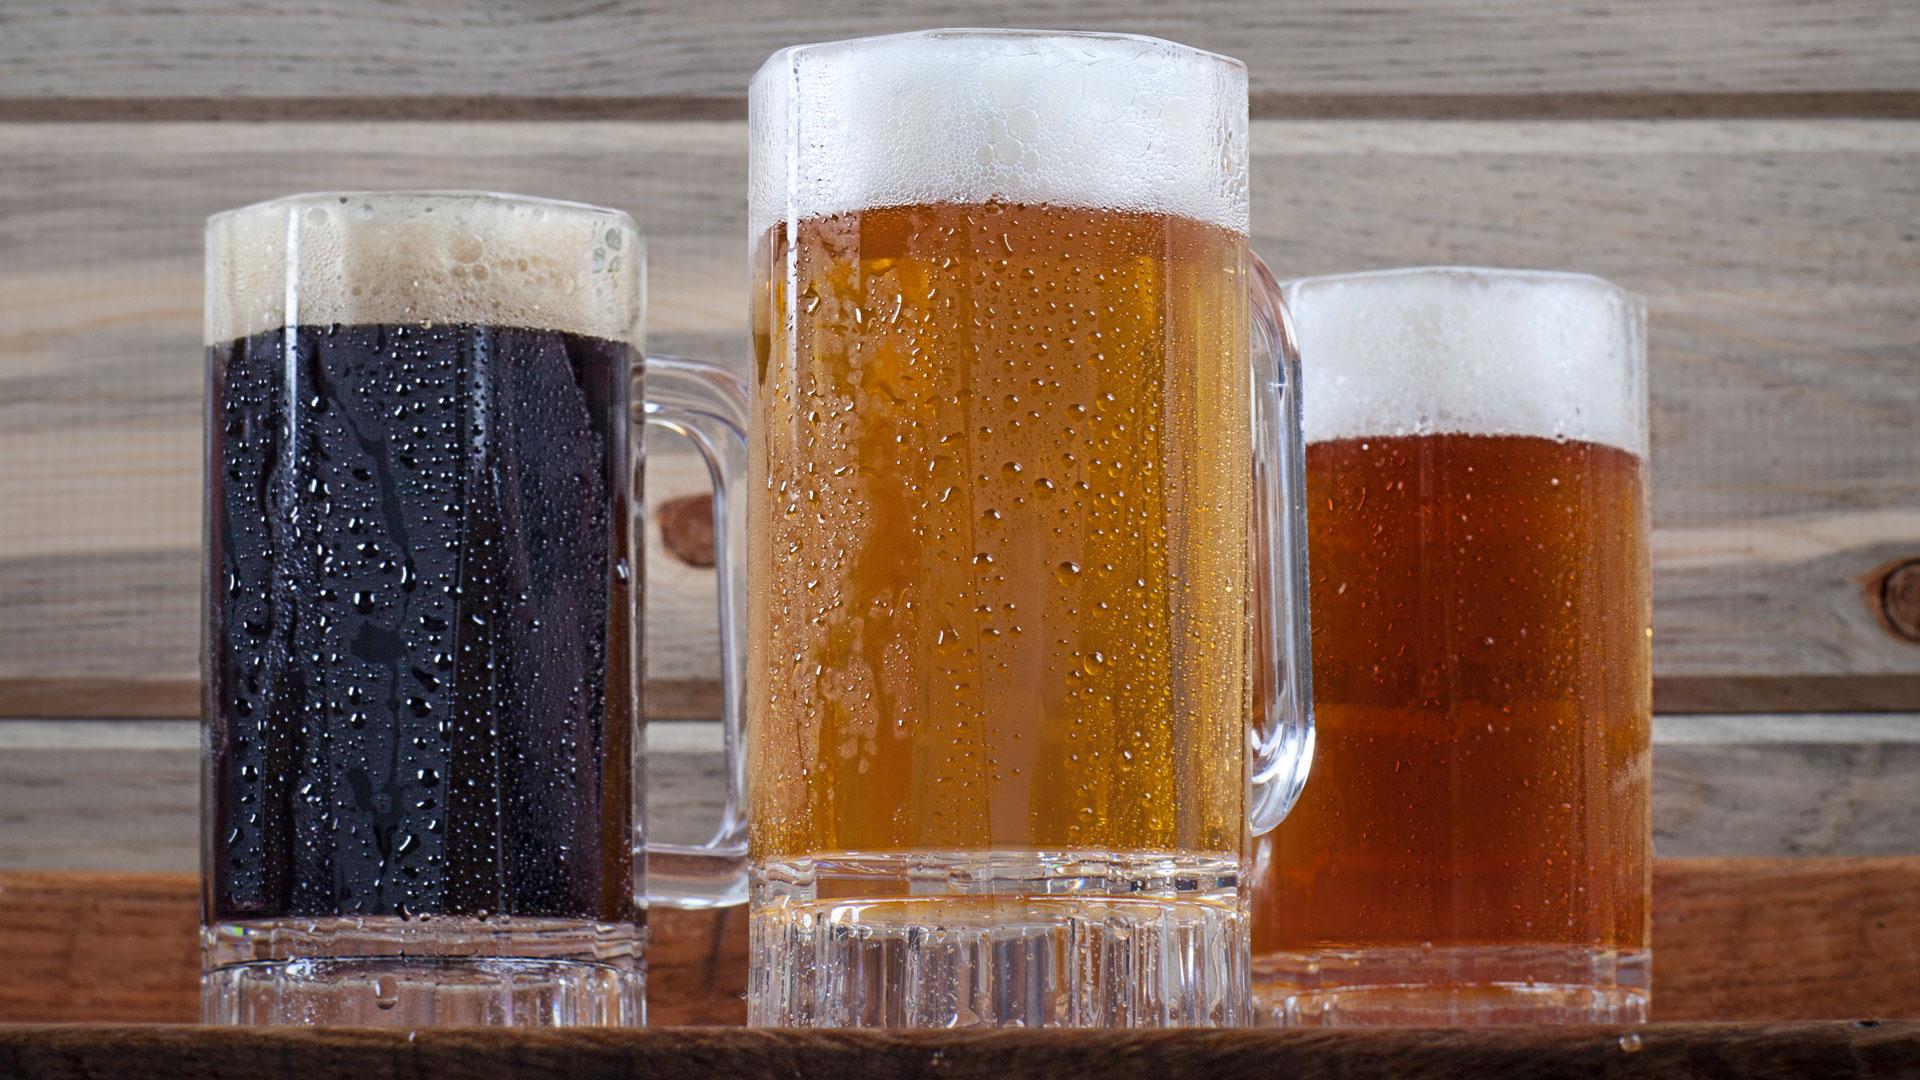 Thinktomake-Craft-Beer-Food-Photography.jpg